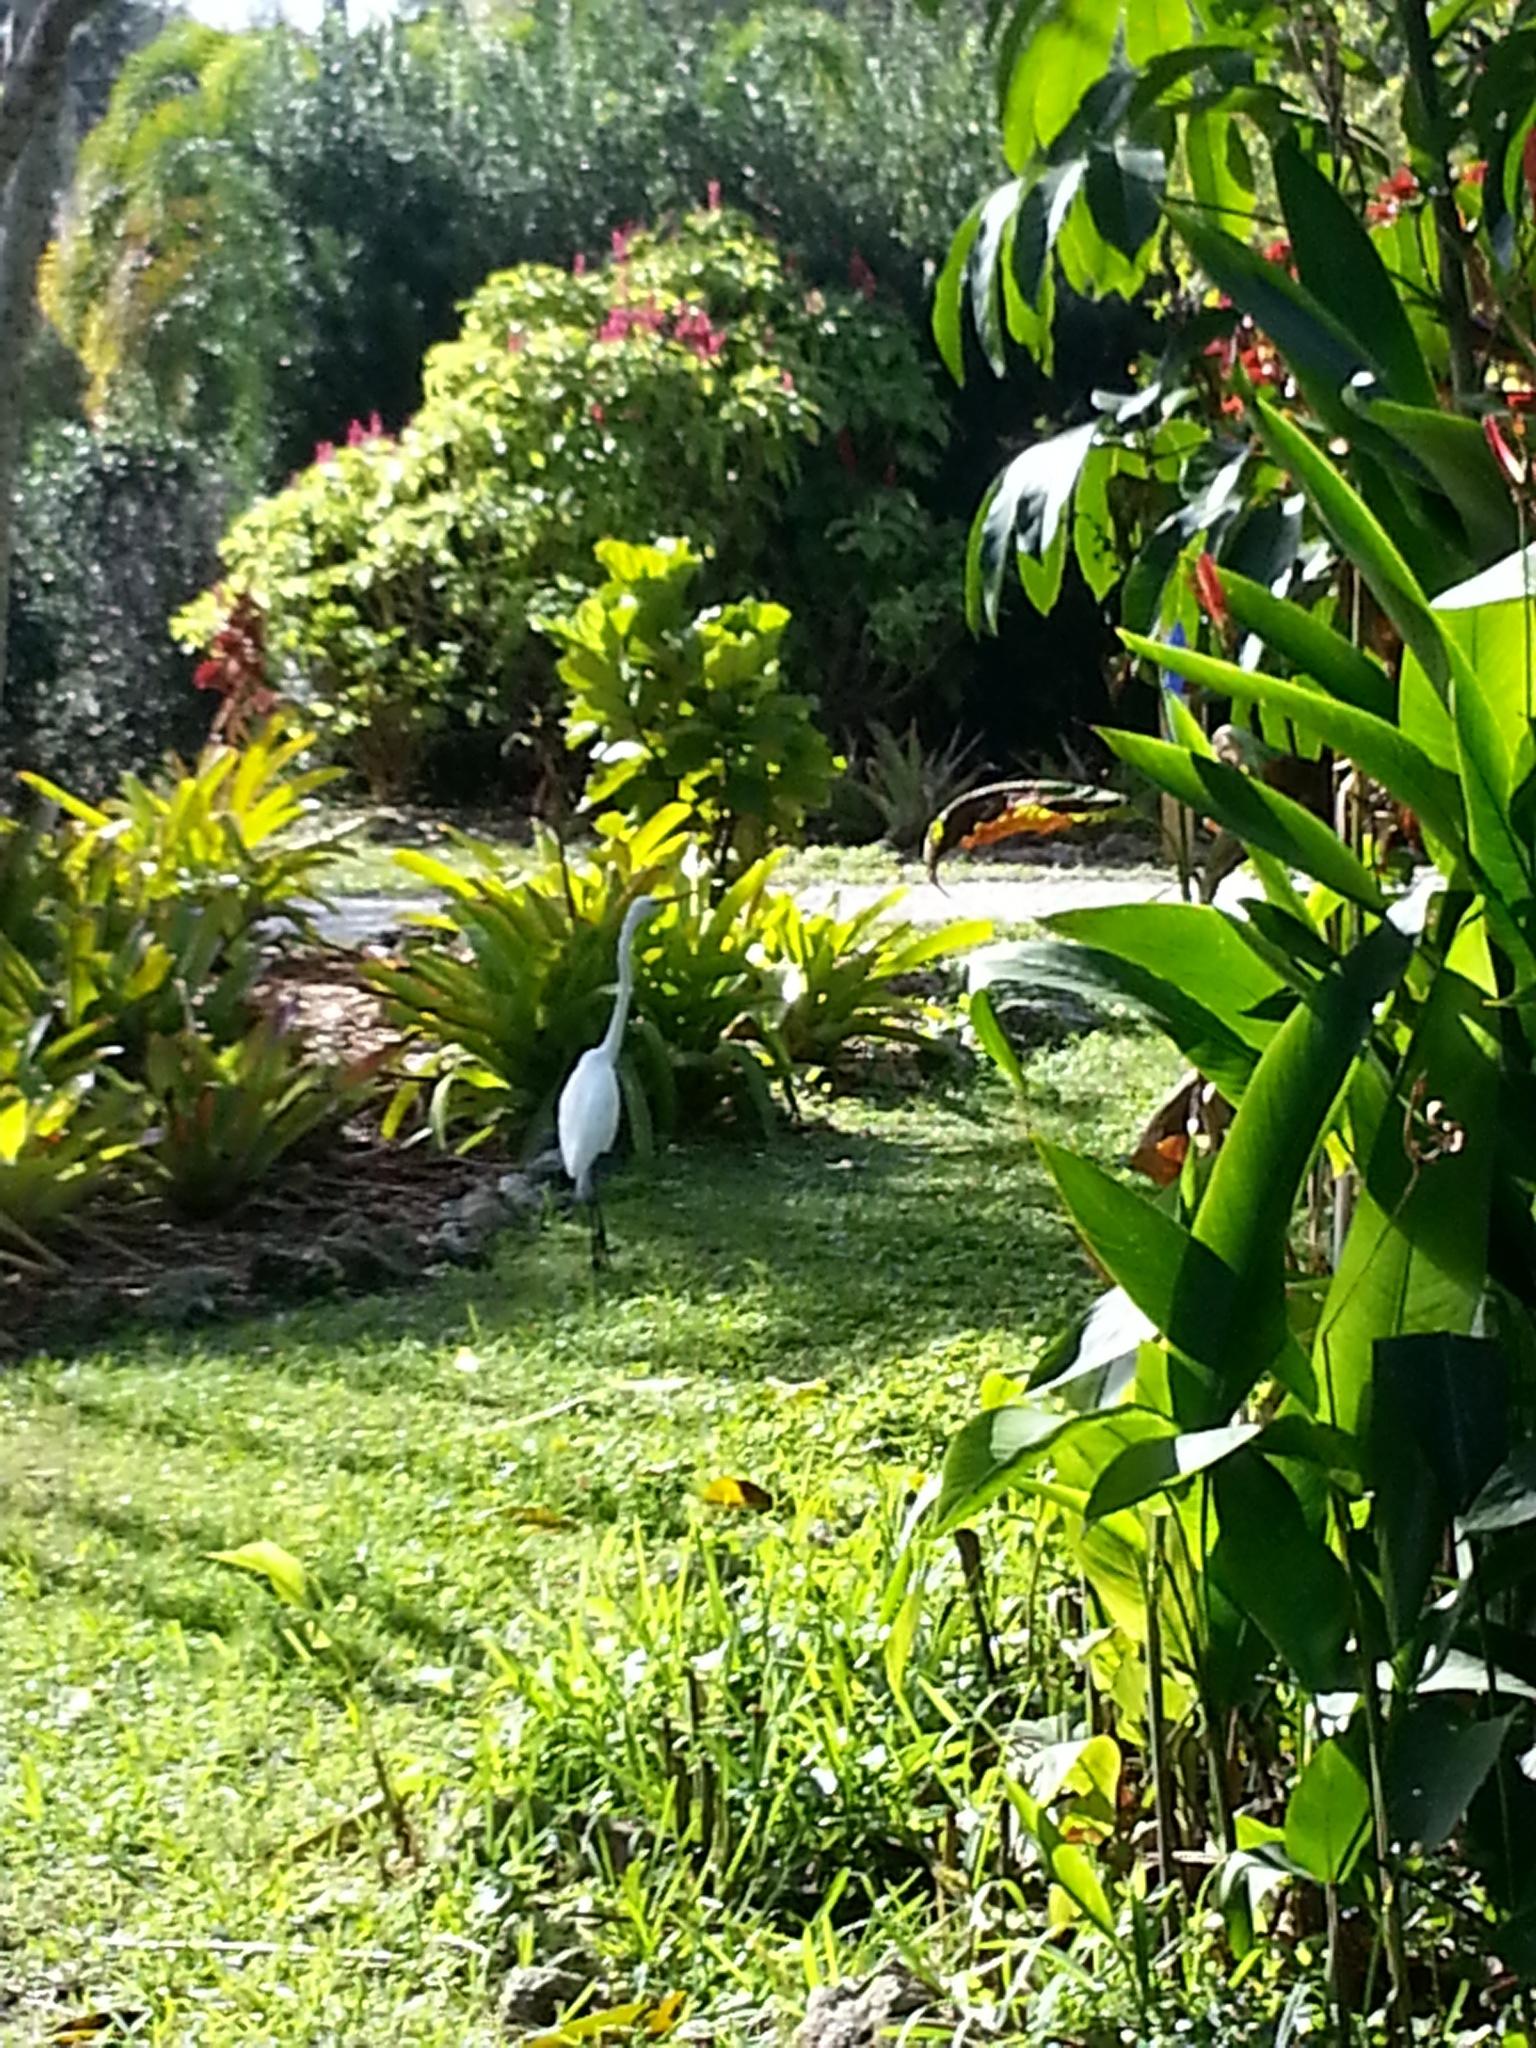 egret 2 by pamela.kanarr